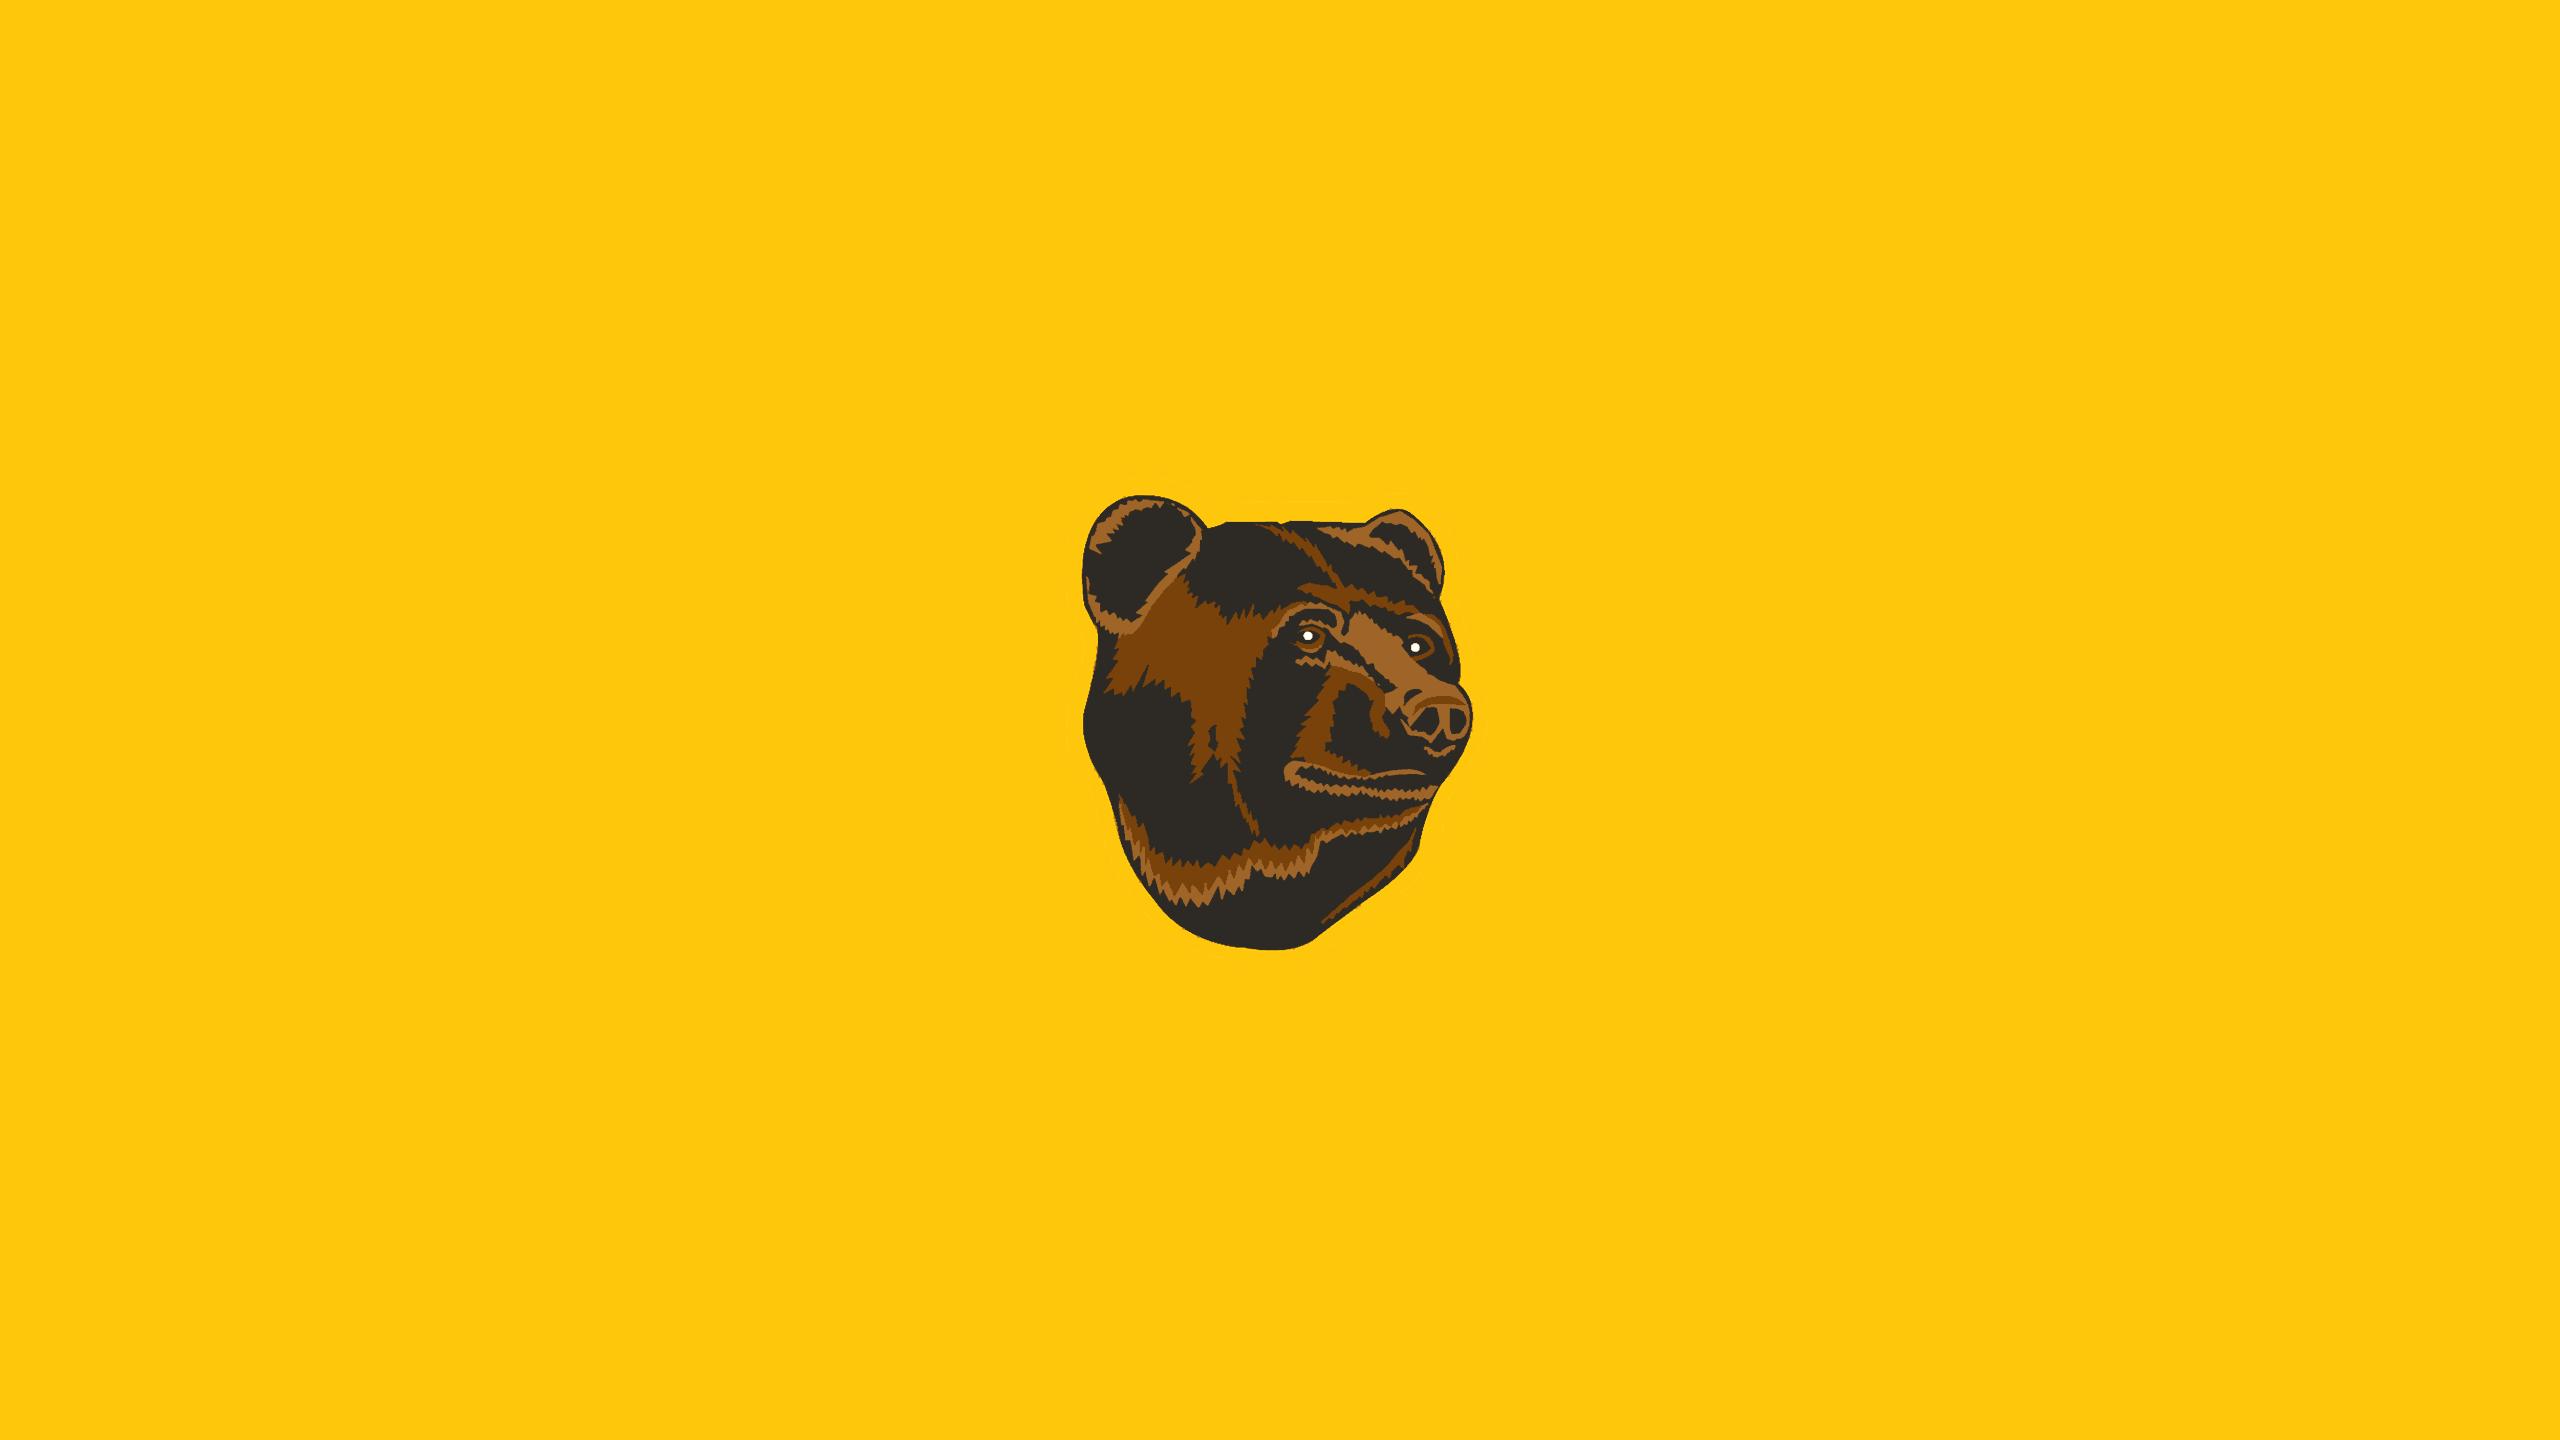 Boston Bruins (Pooh Bear)